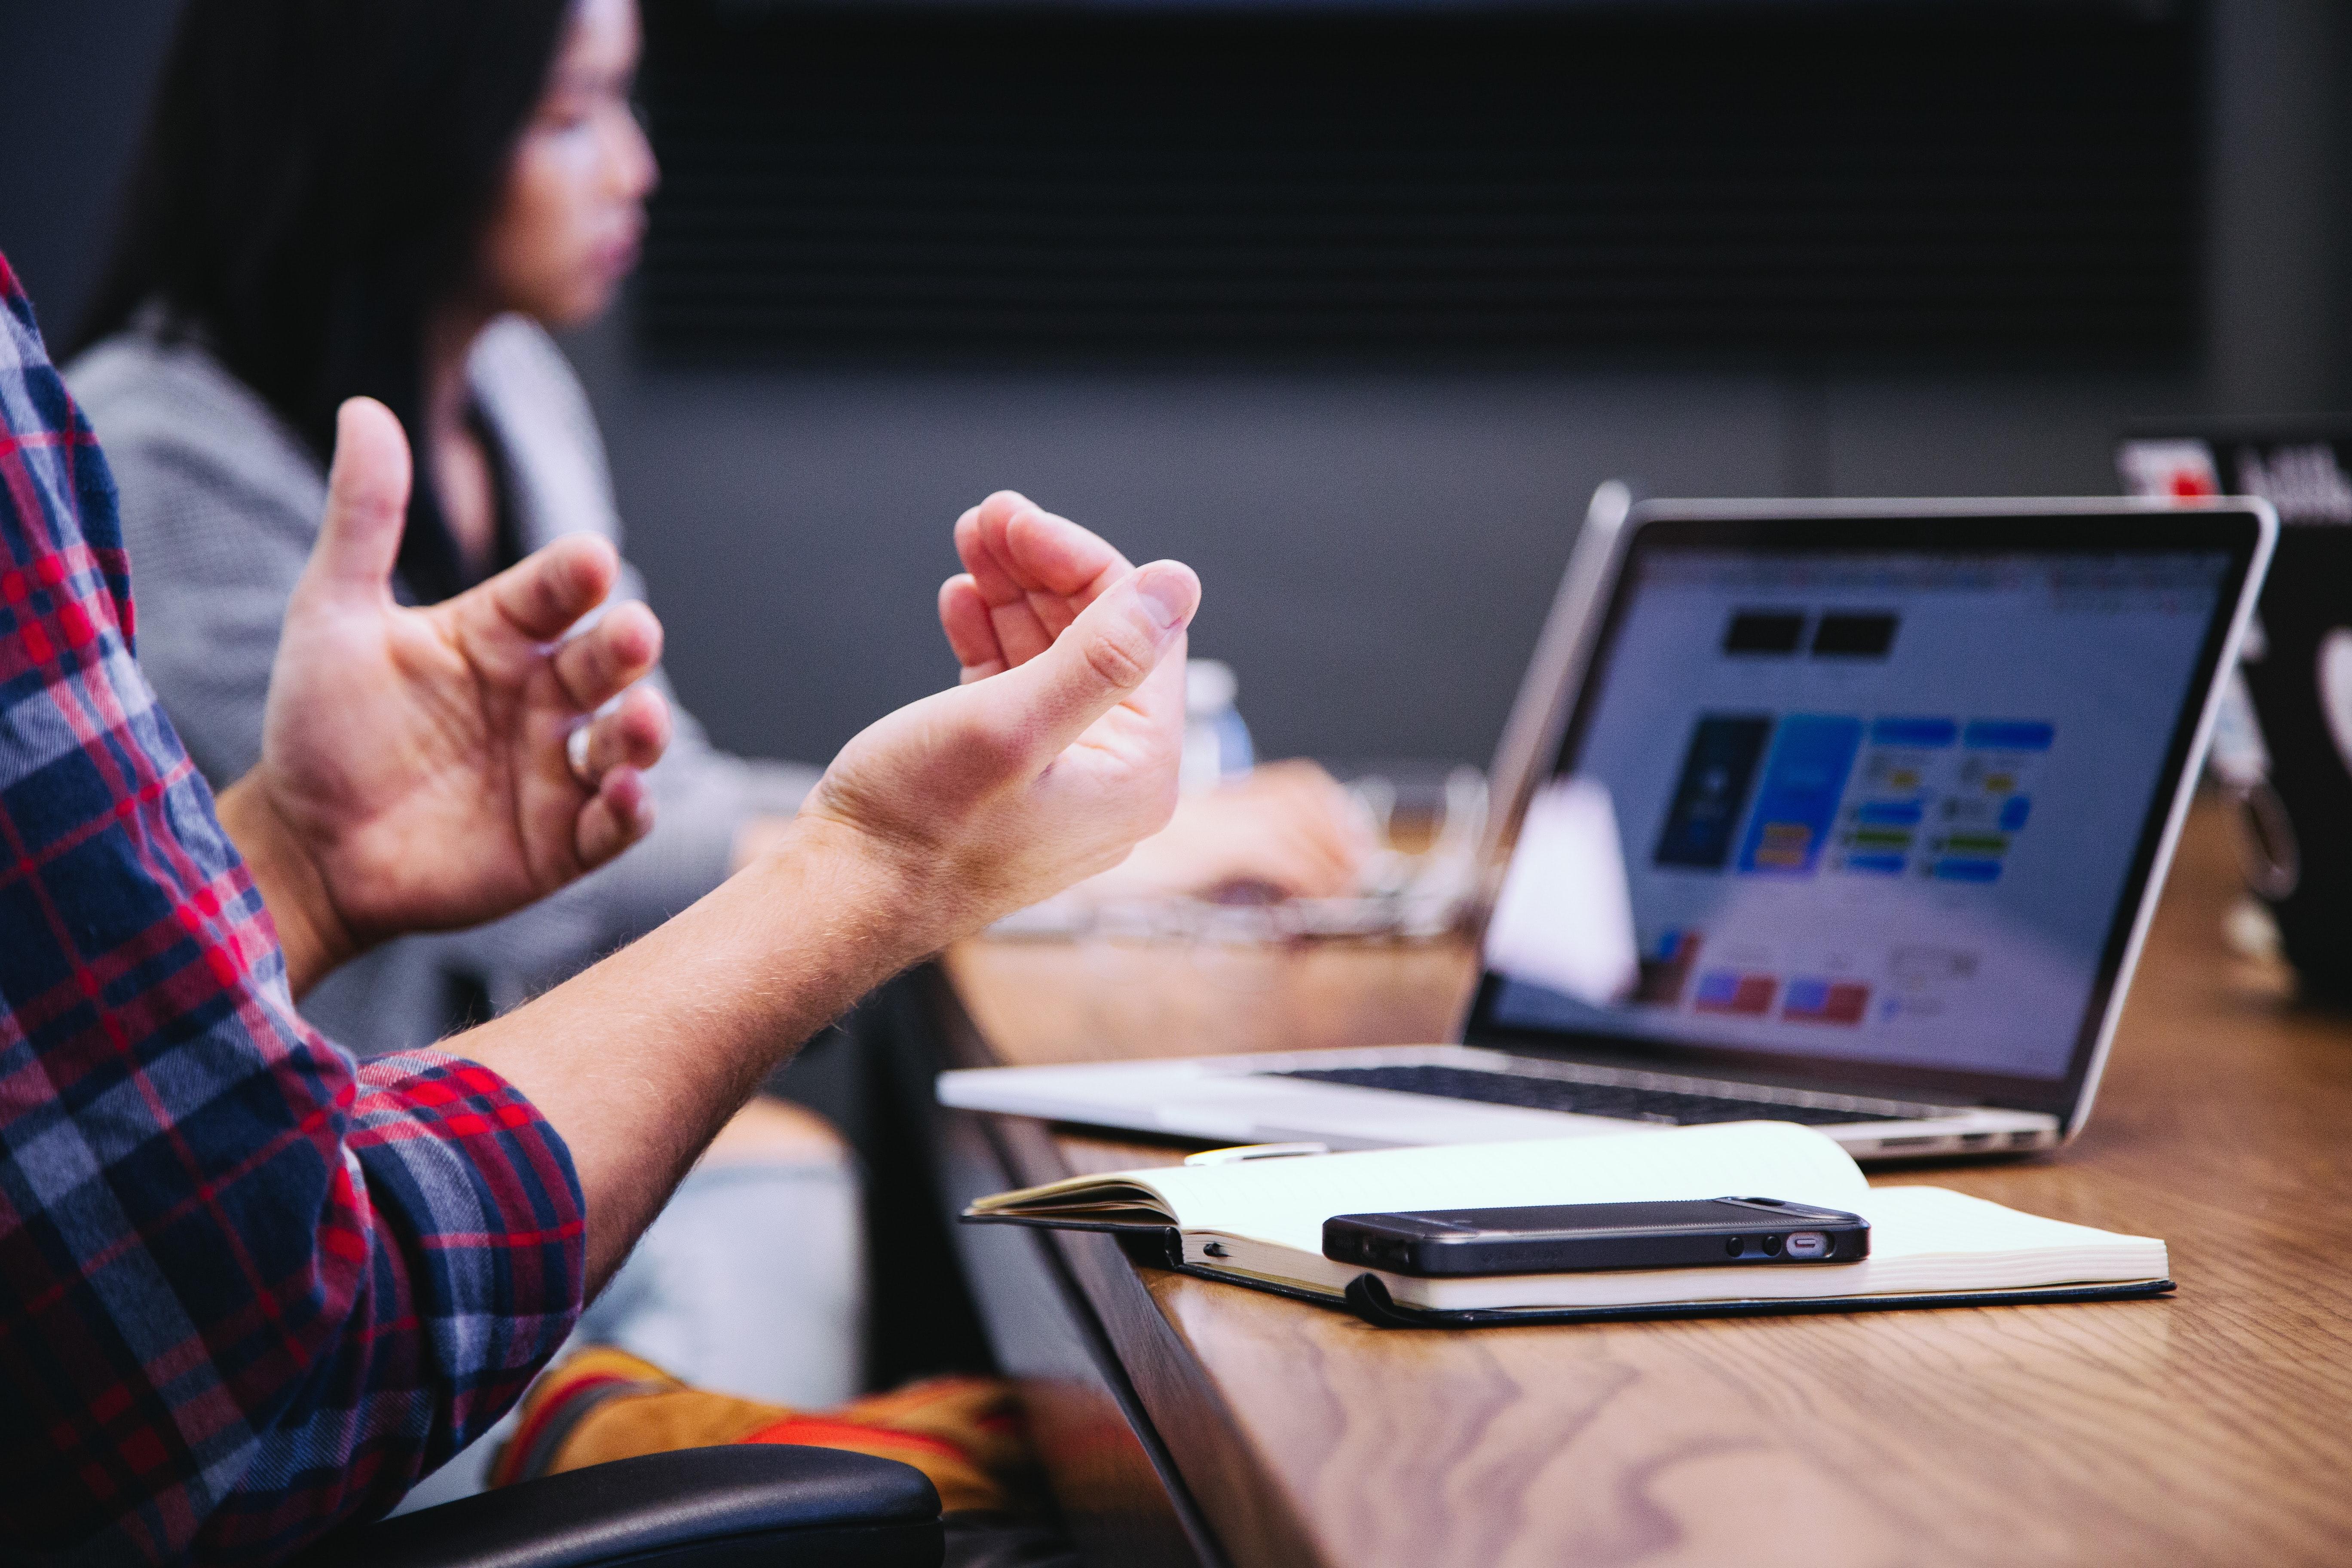 Digitale Planung in der Hochschulausbildung